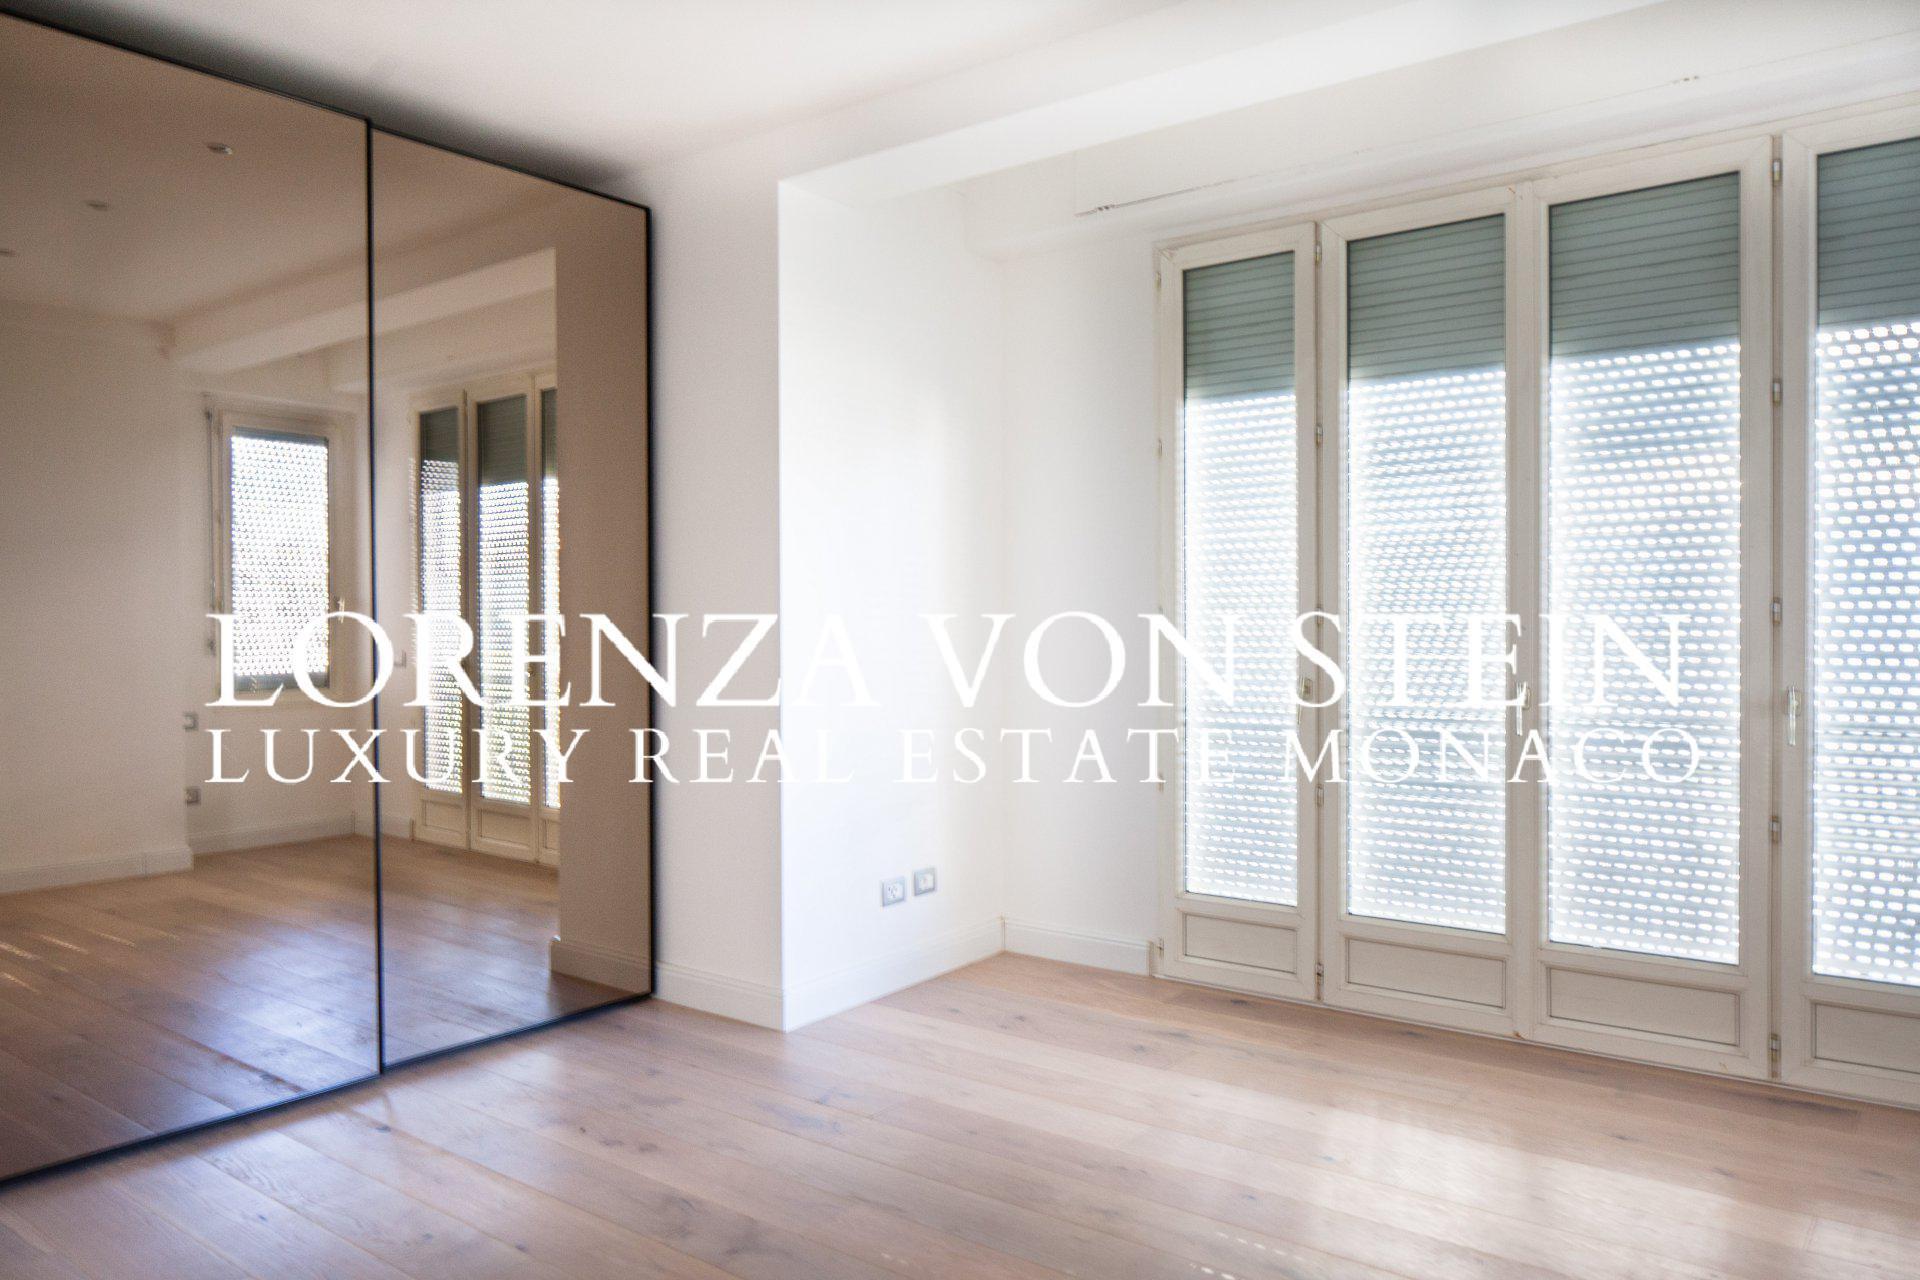 verk ufe luxus penthouse wohnung monaco monte carlo. Black Bedroom Furniture Sets. Home Design Ideas